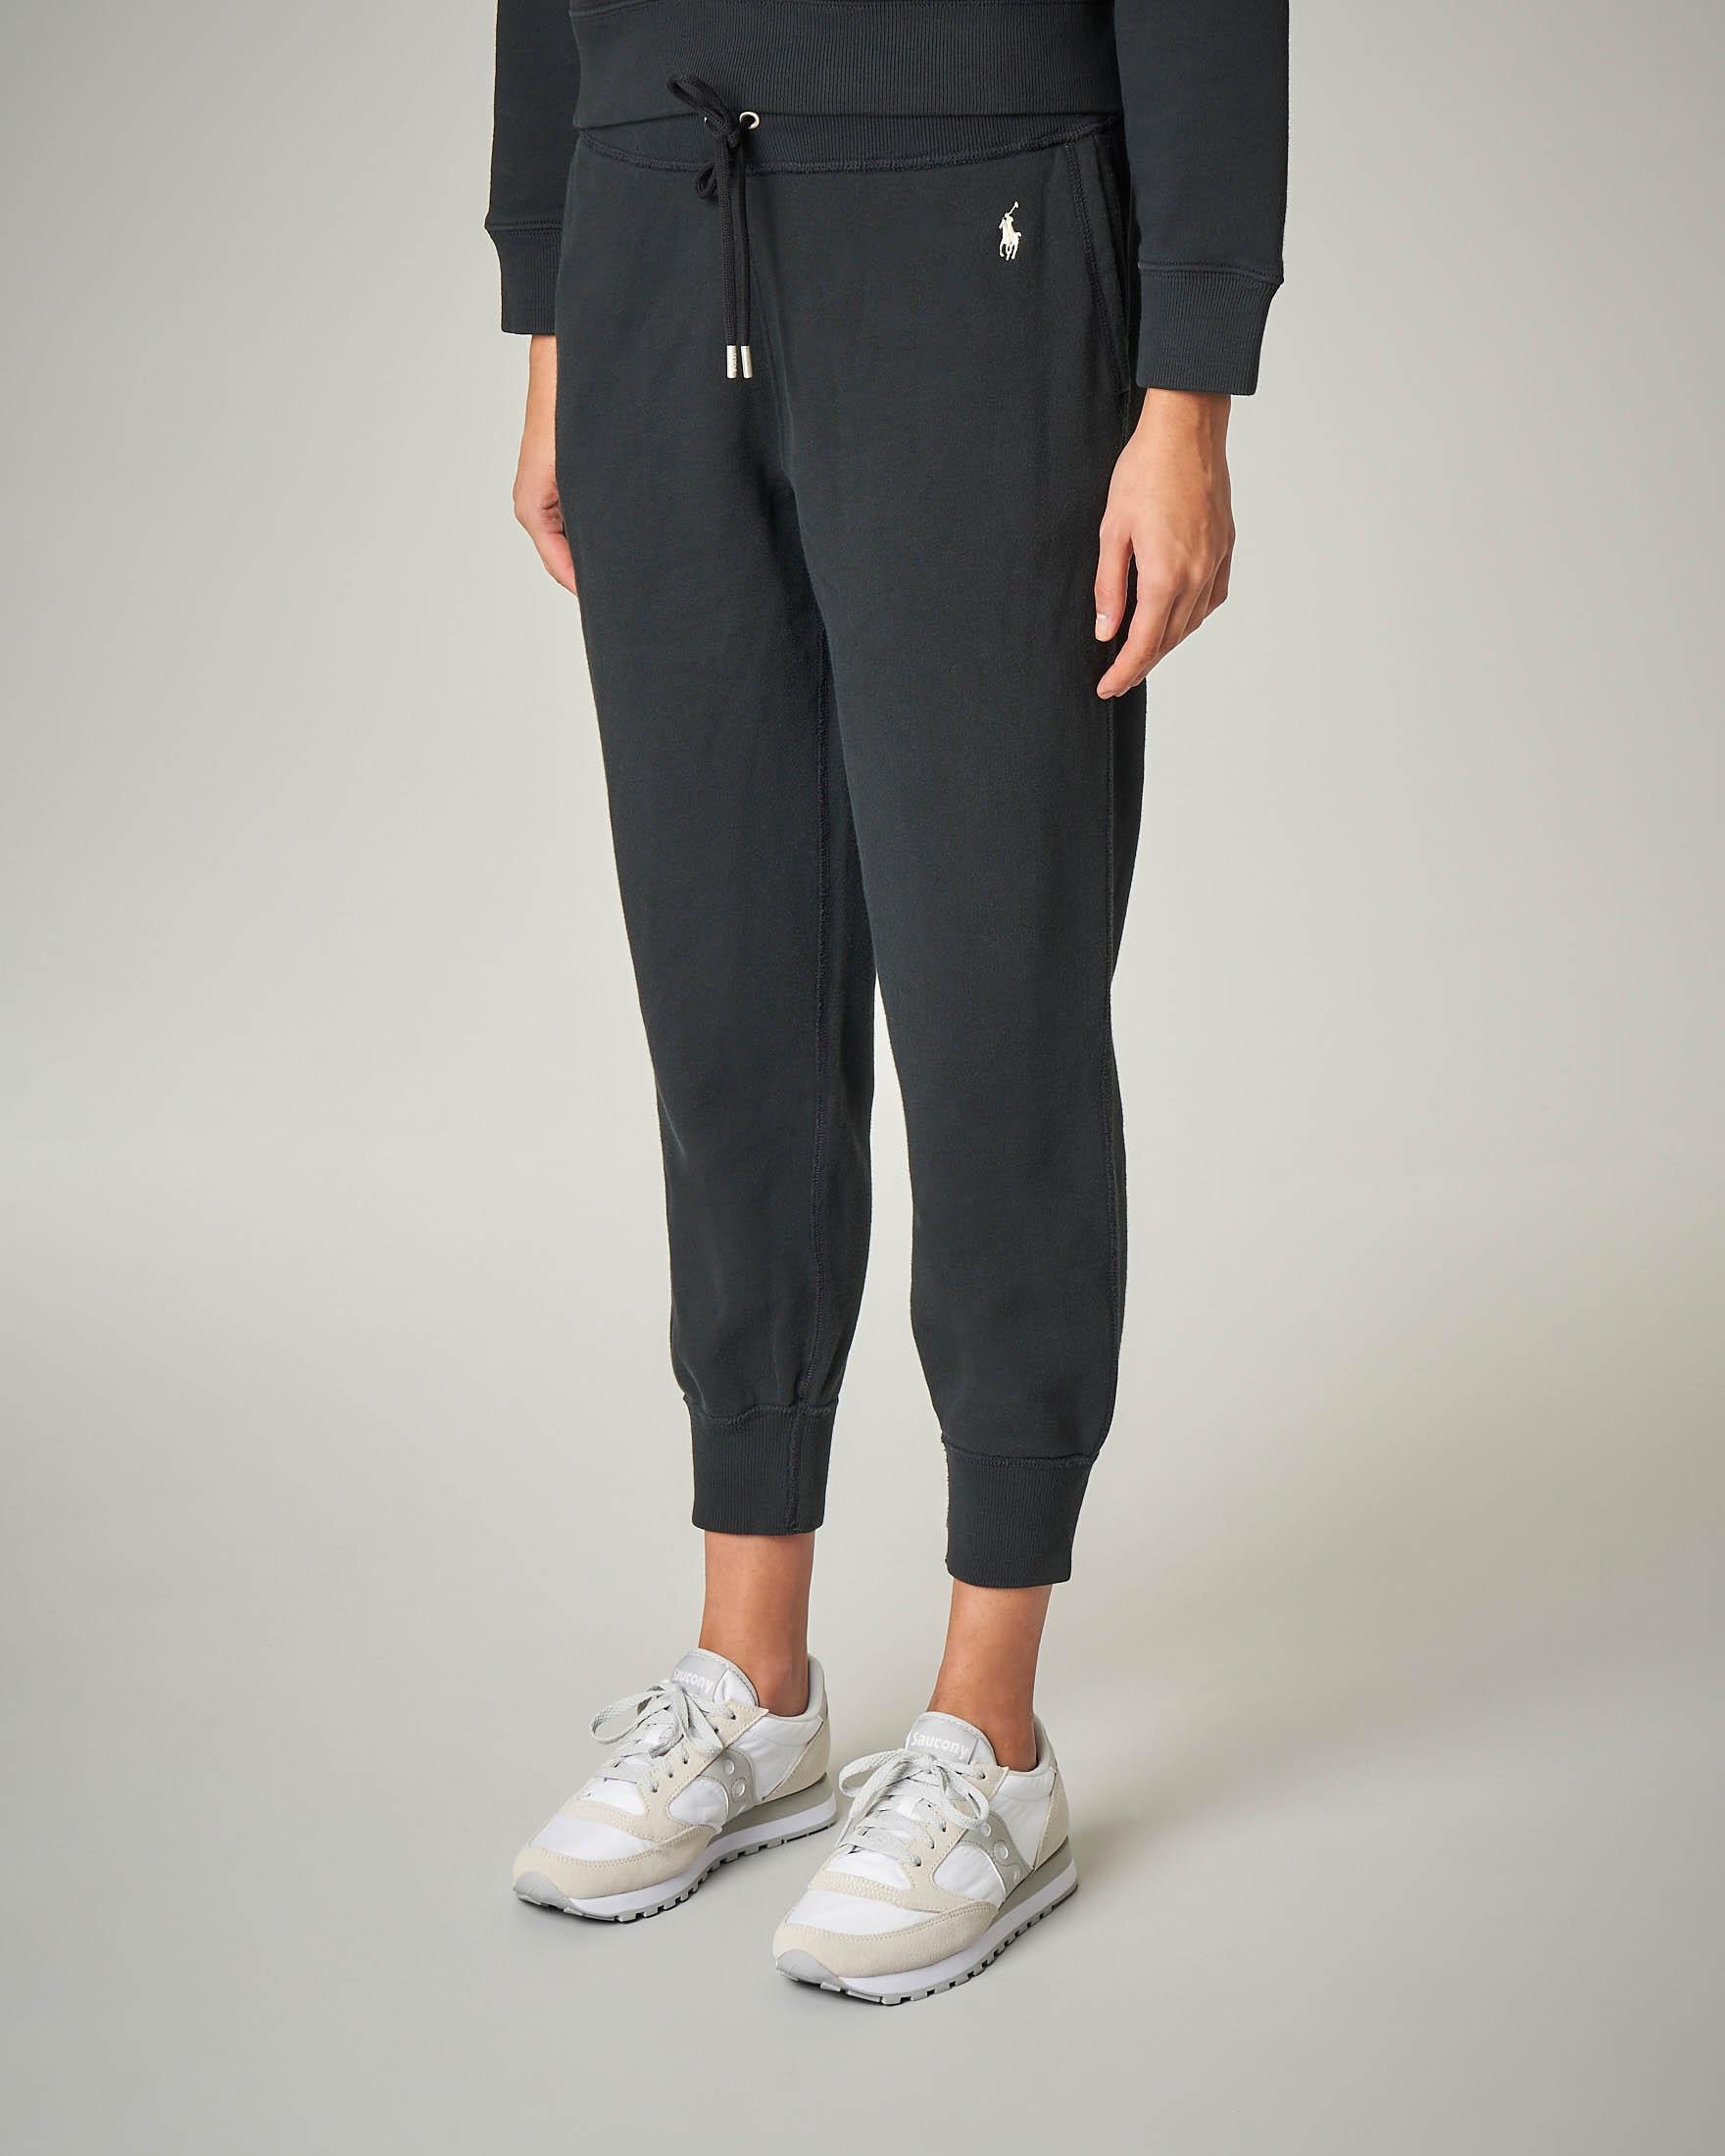 Pantaloni tuta neri in felpa